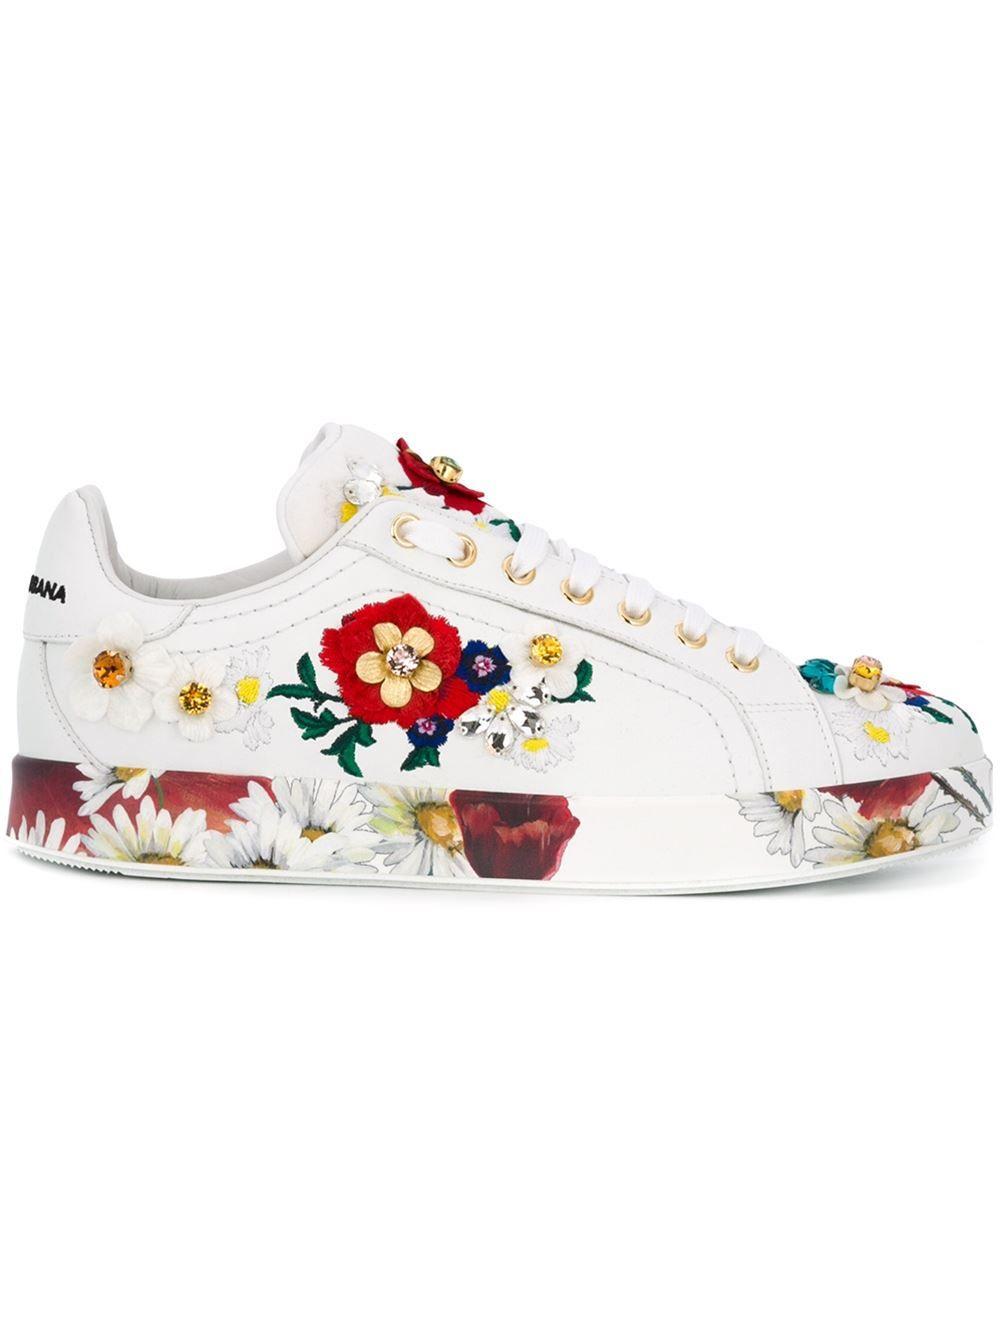 Blanc Chaussures Dolce & Gabbana Femmes CSrrs7